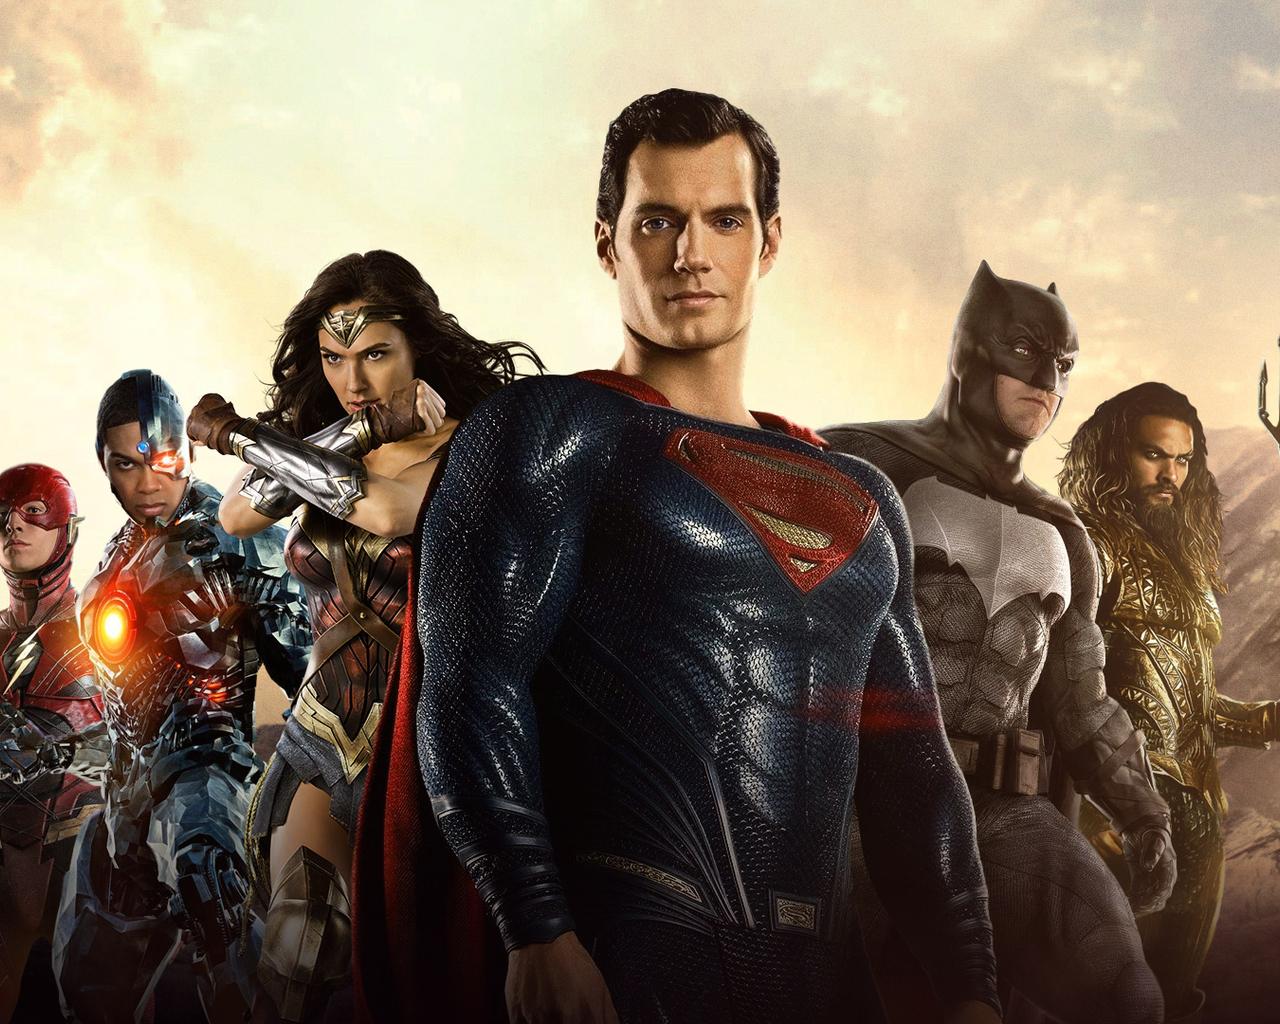 Justice League 2017 Movie 4k Hd Desktop Wallpaper For 4k: 1280x1024 Justice League 2017 Movie 1280x1024 Resolution